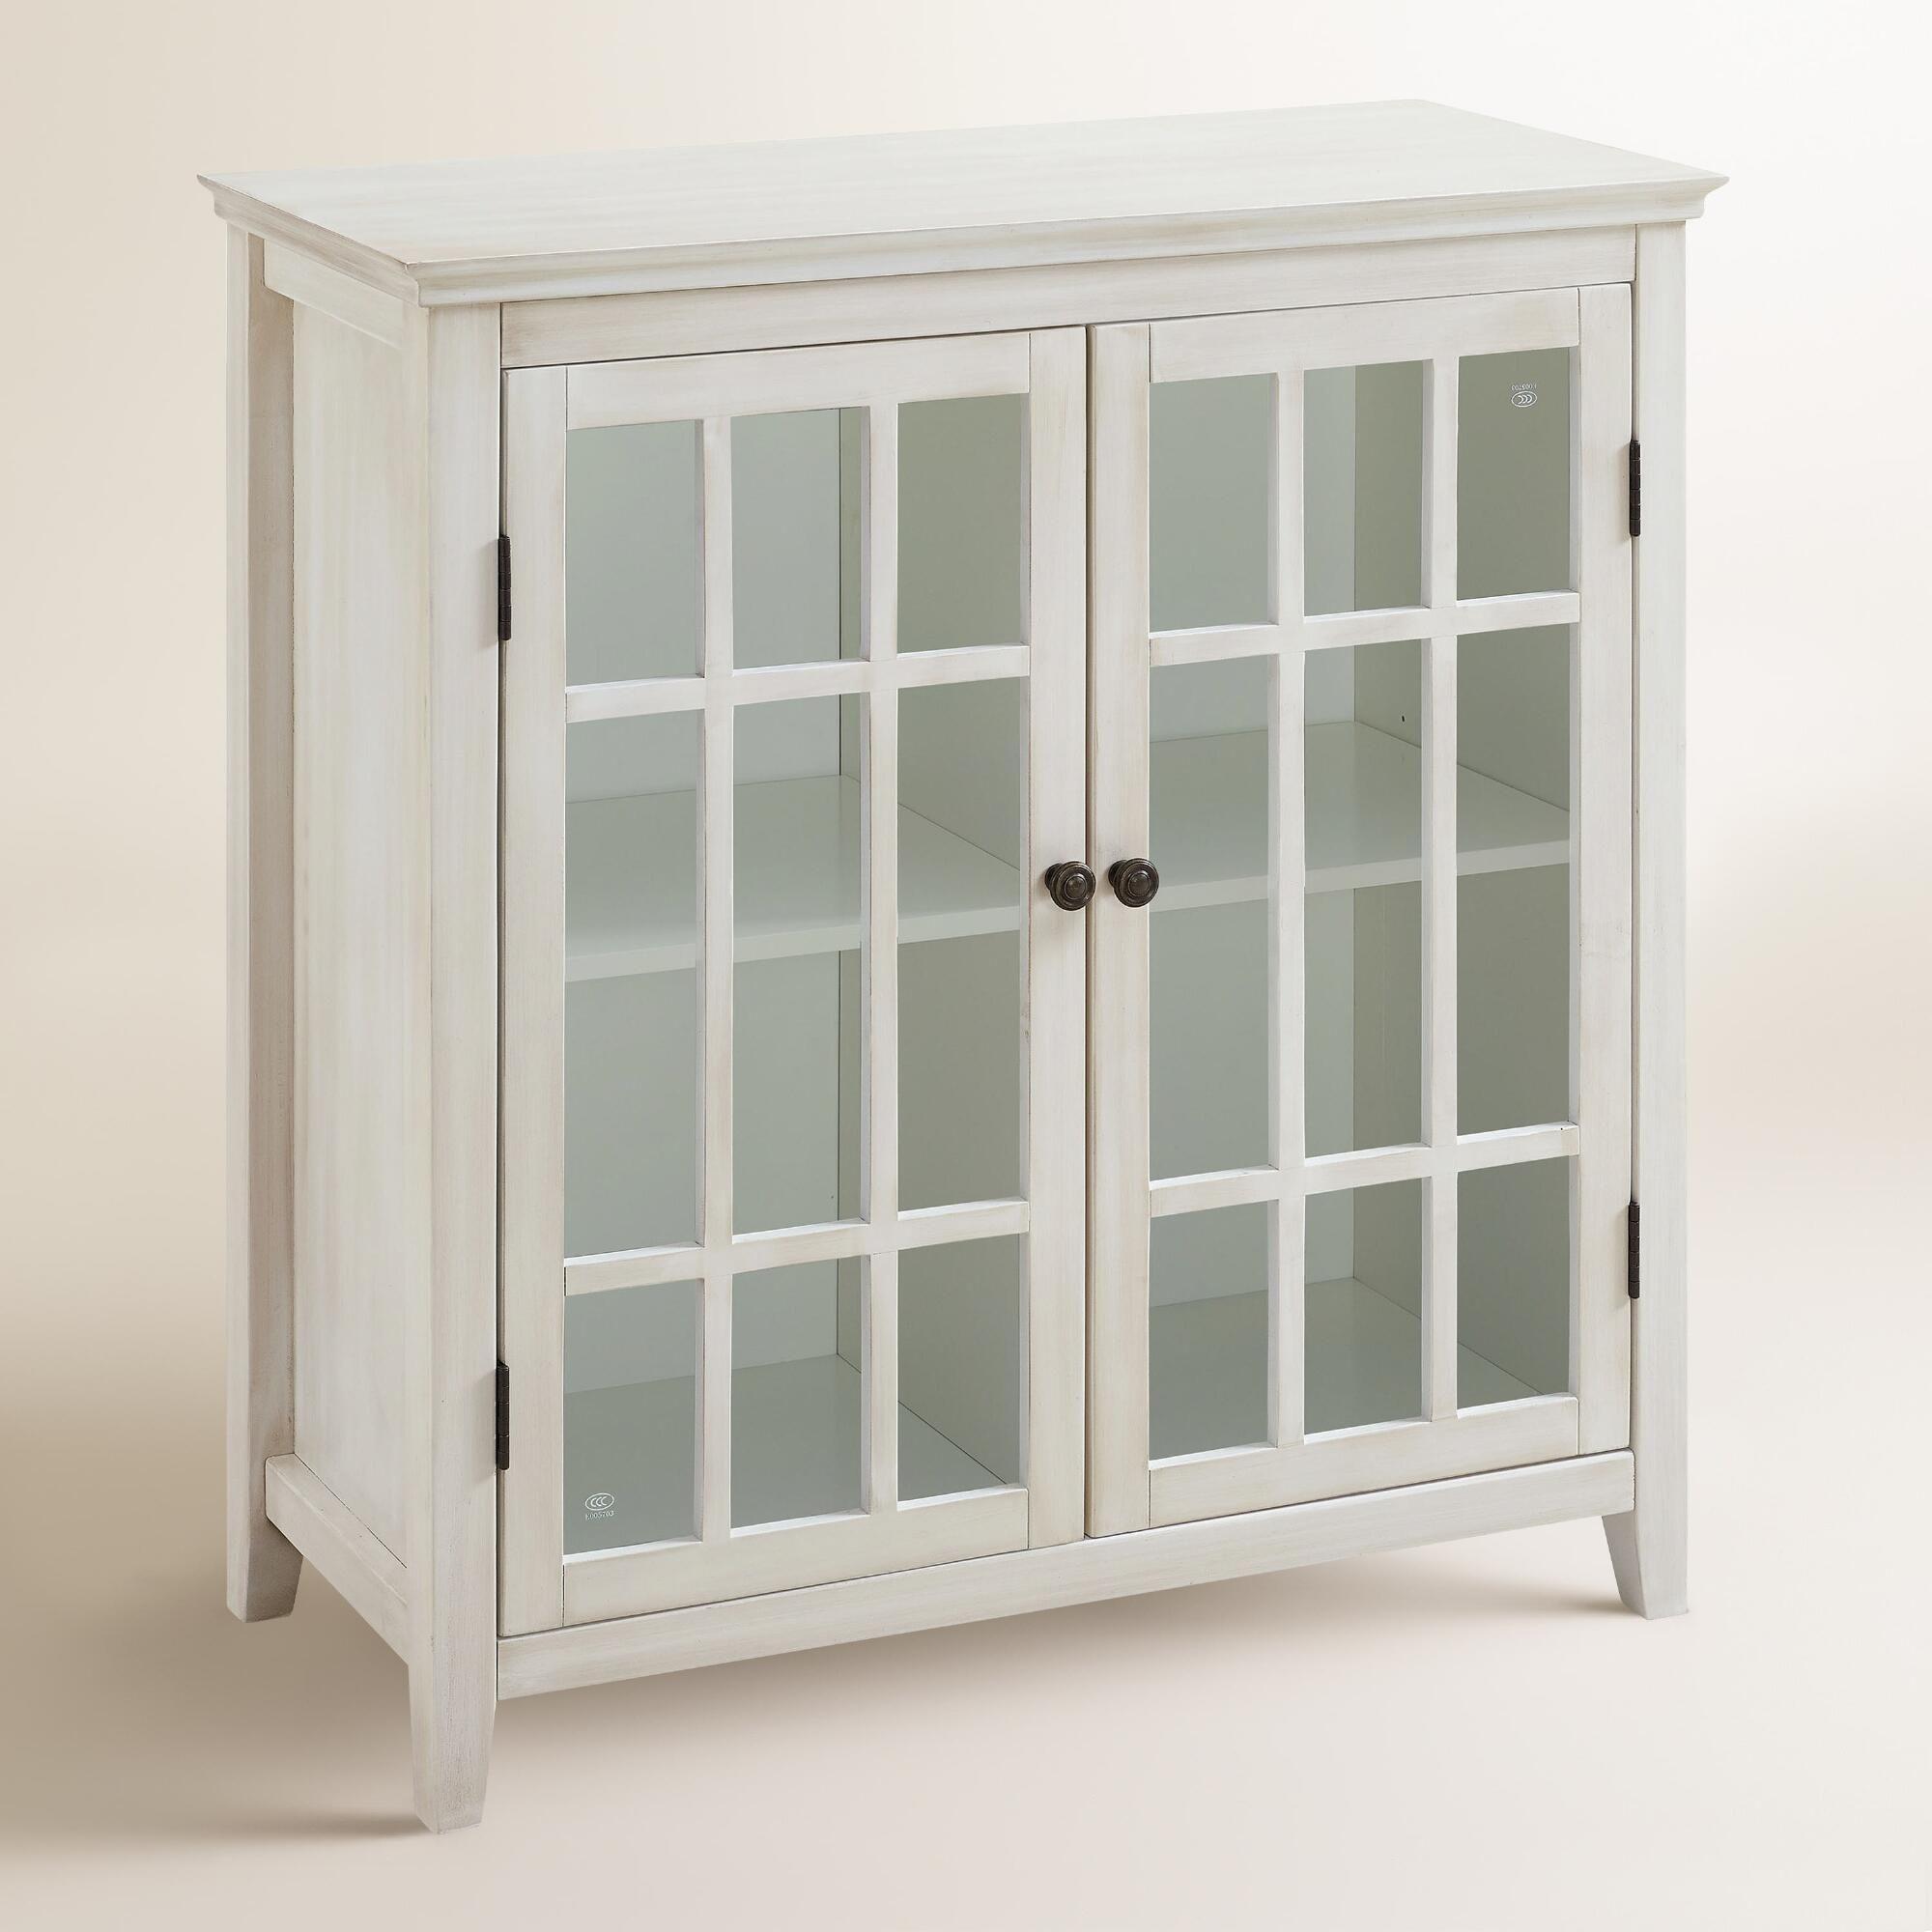 Antique White Double Door Storage Cabinet